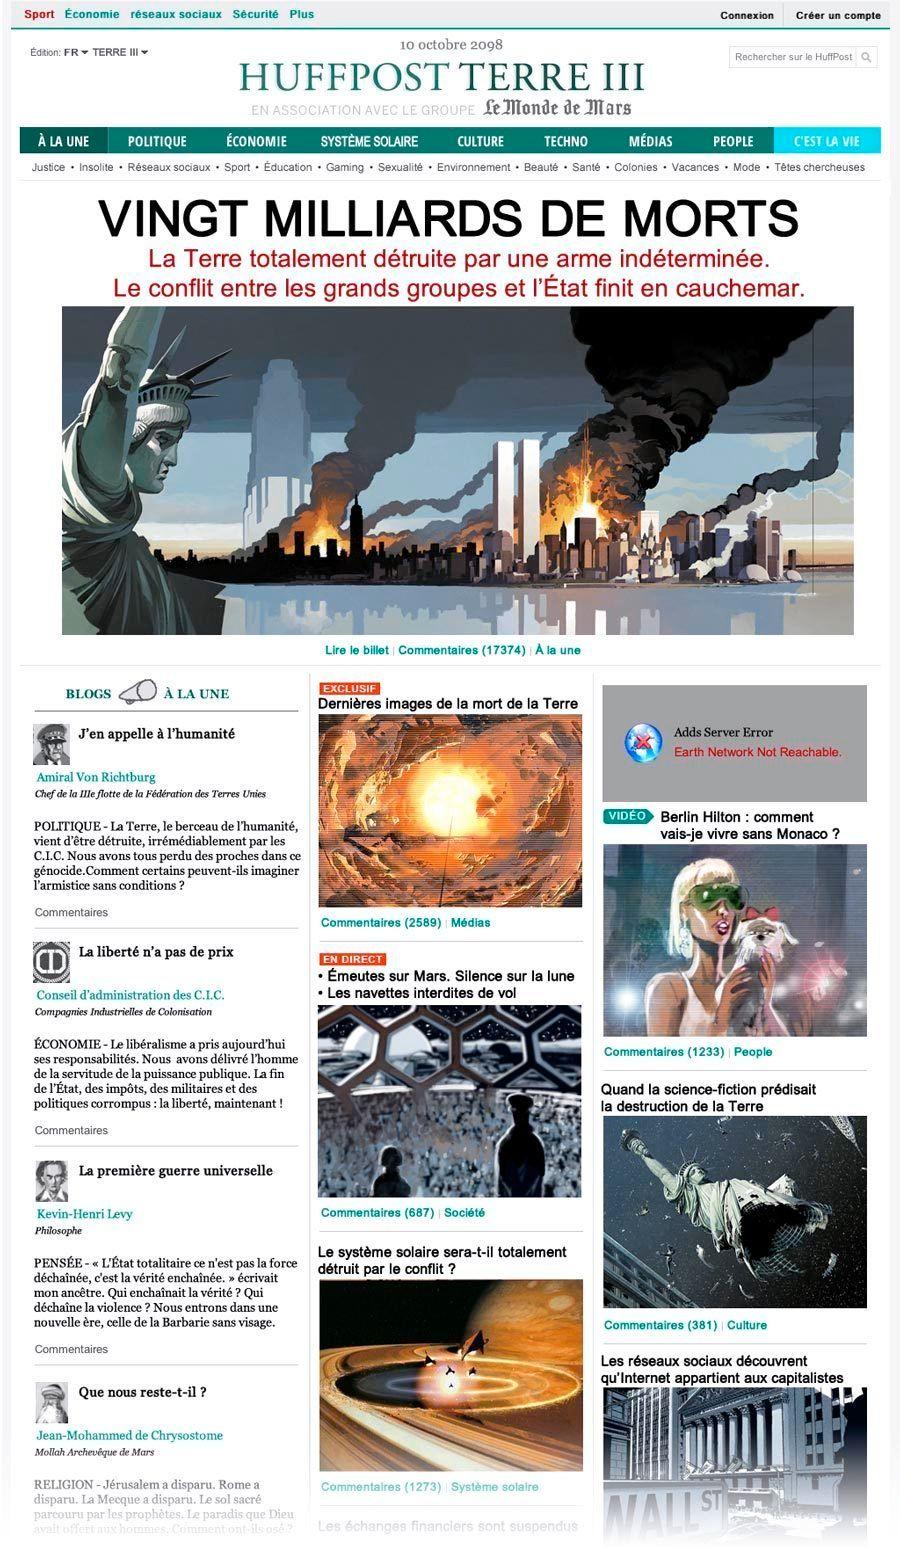 Universal War 1 : 20 milliards de morts. La